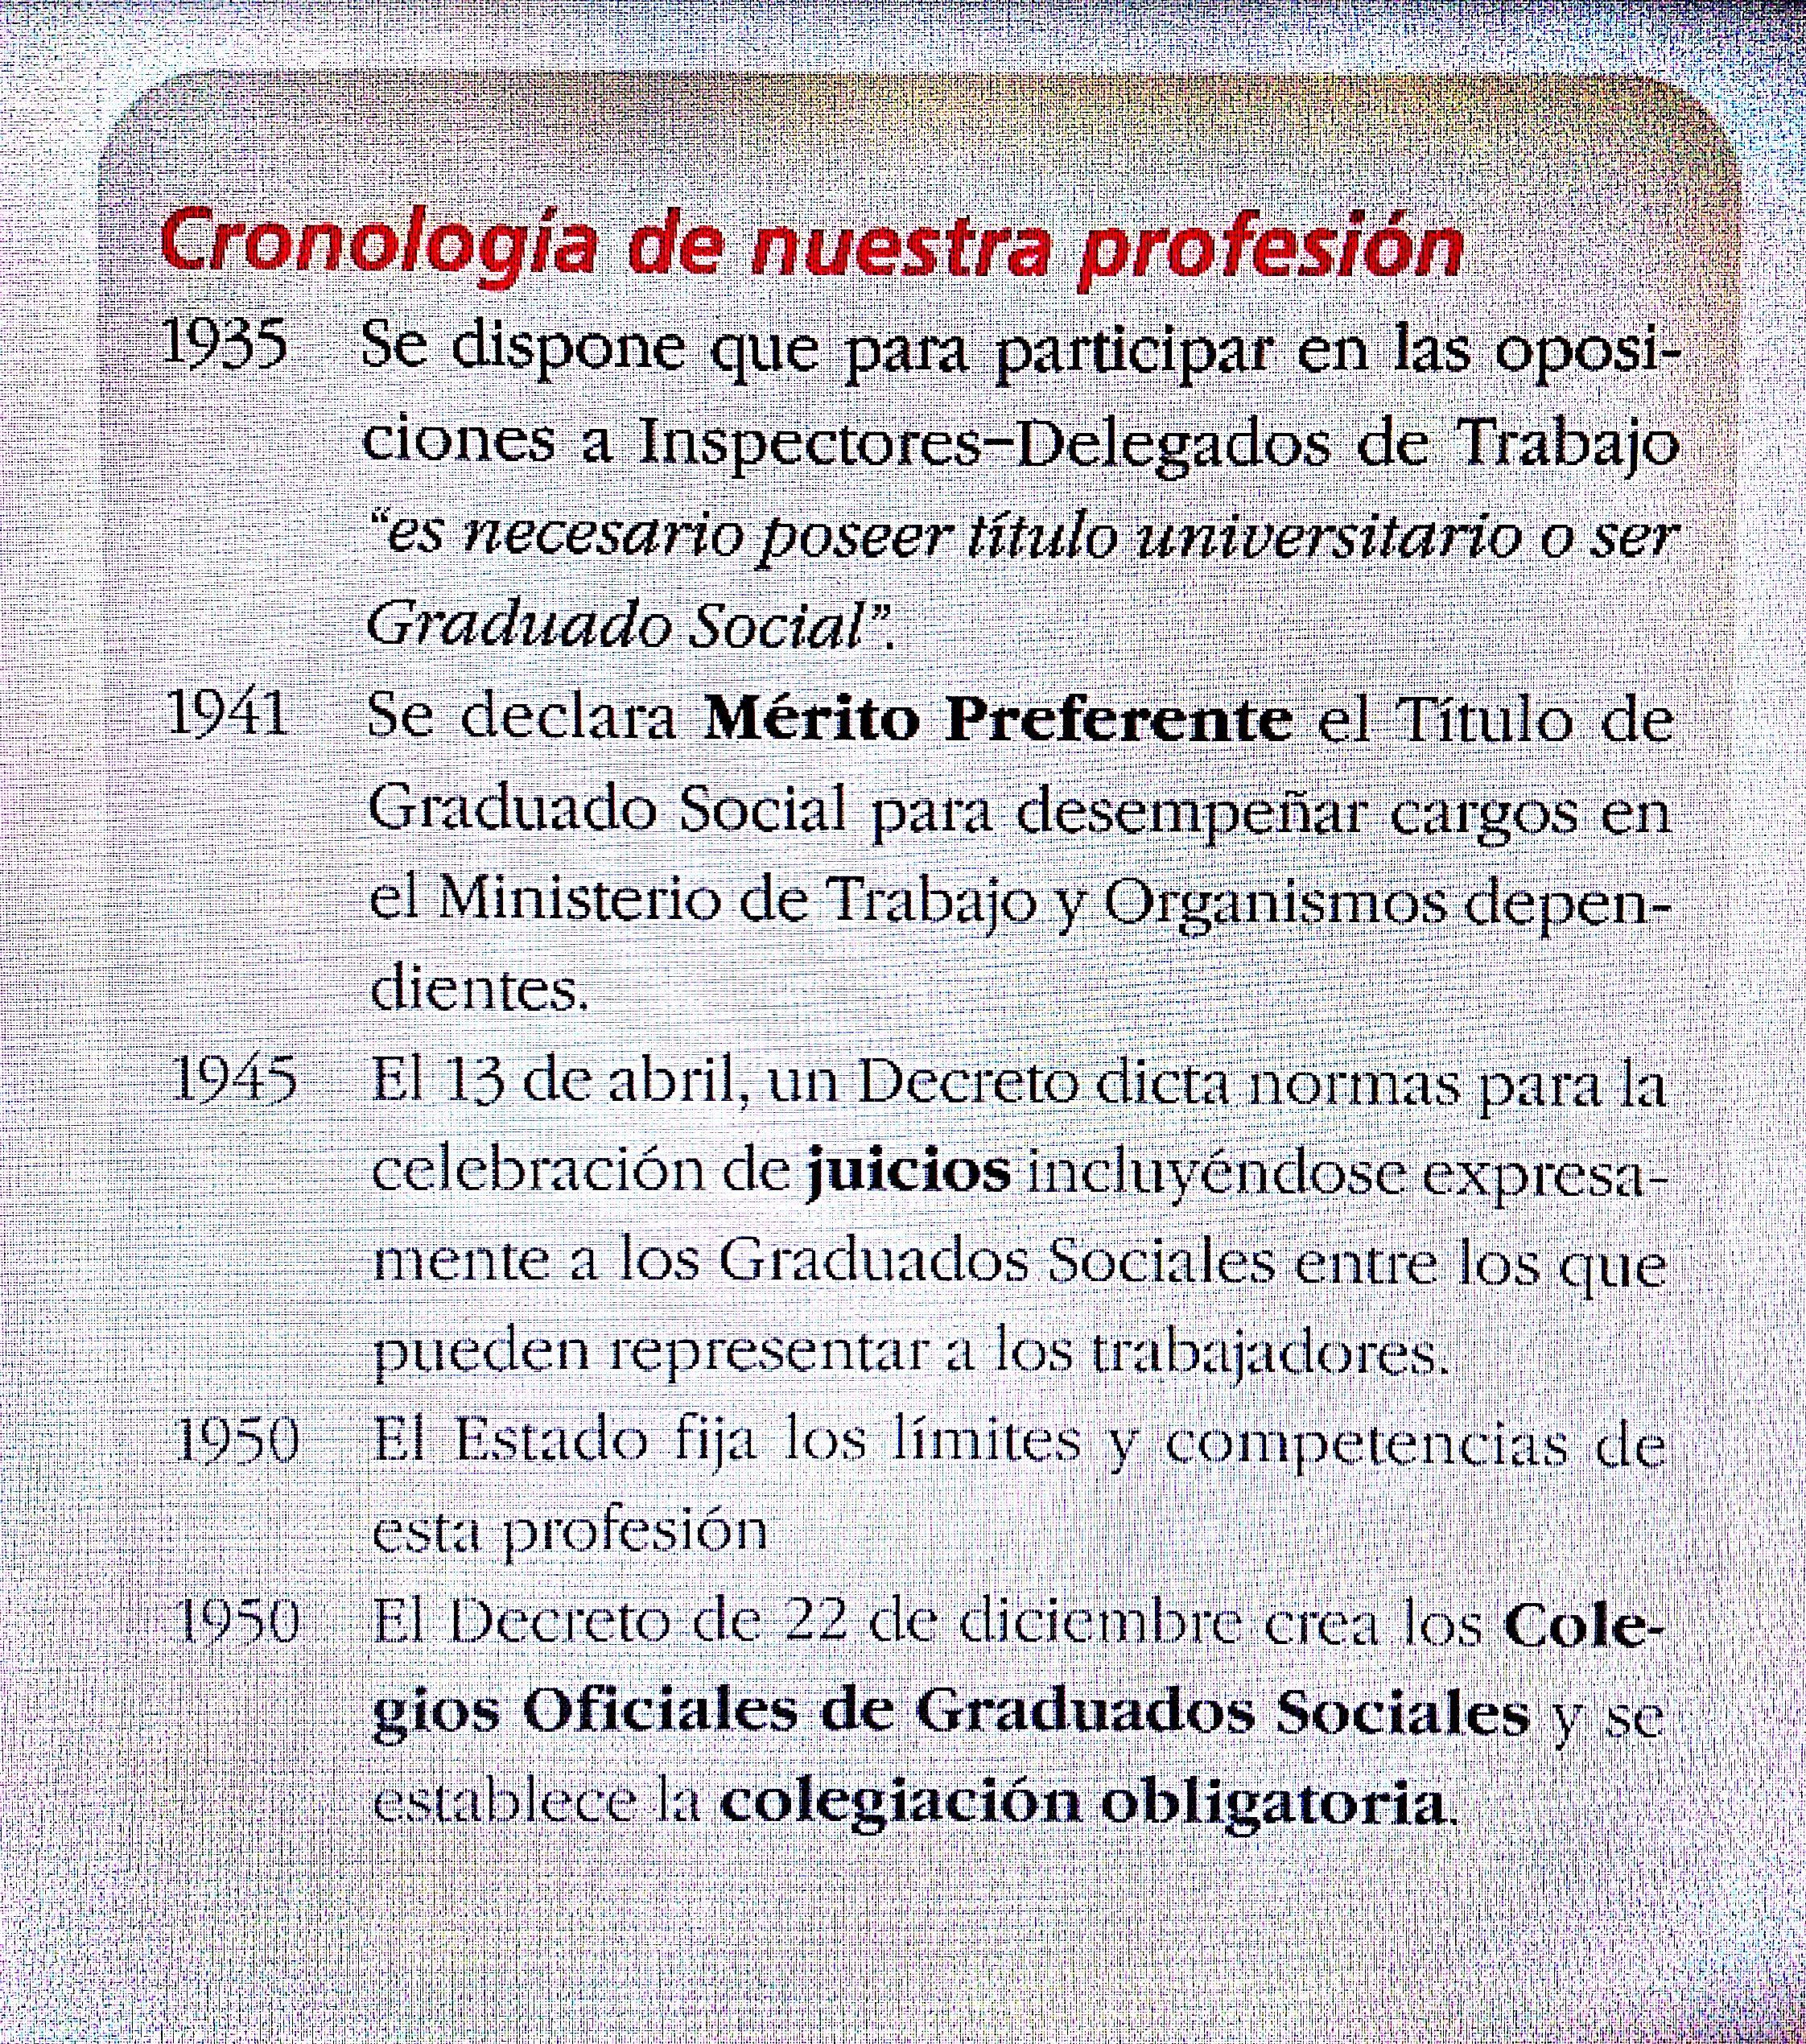 grad sociales cronologia_1